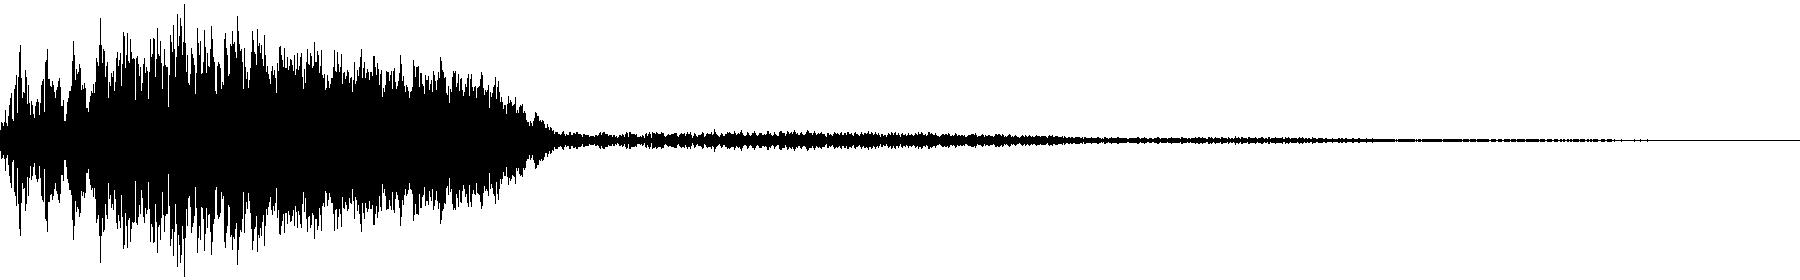 vedh synth cut 064 f